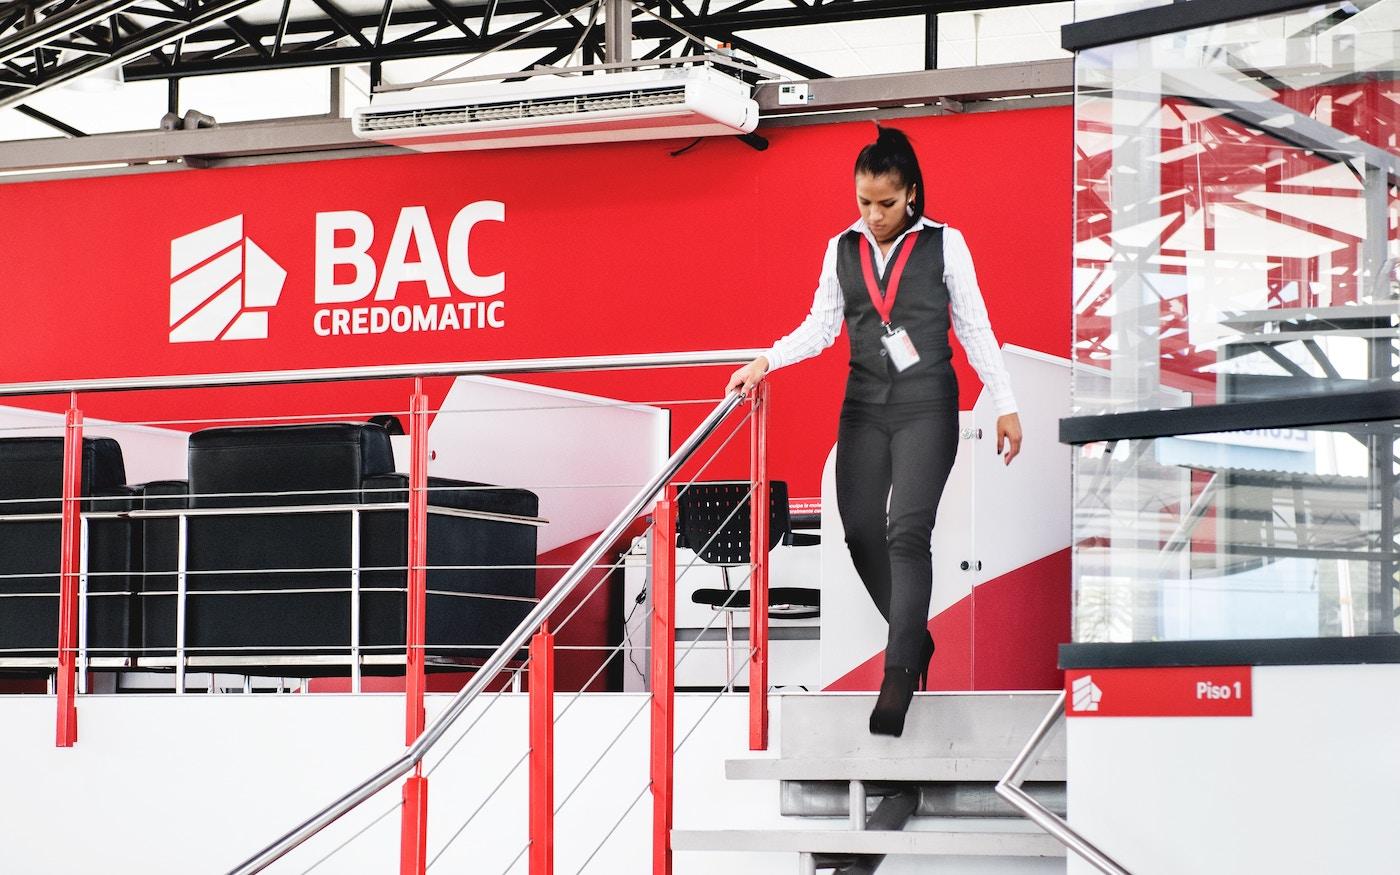 BAC Credomatic location